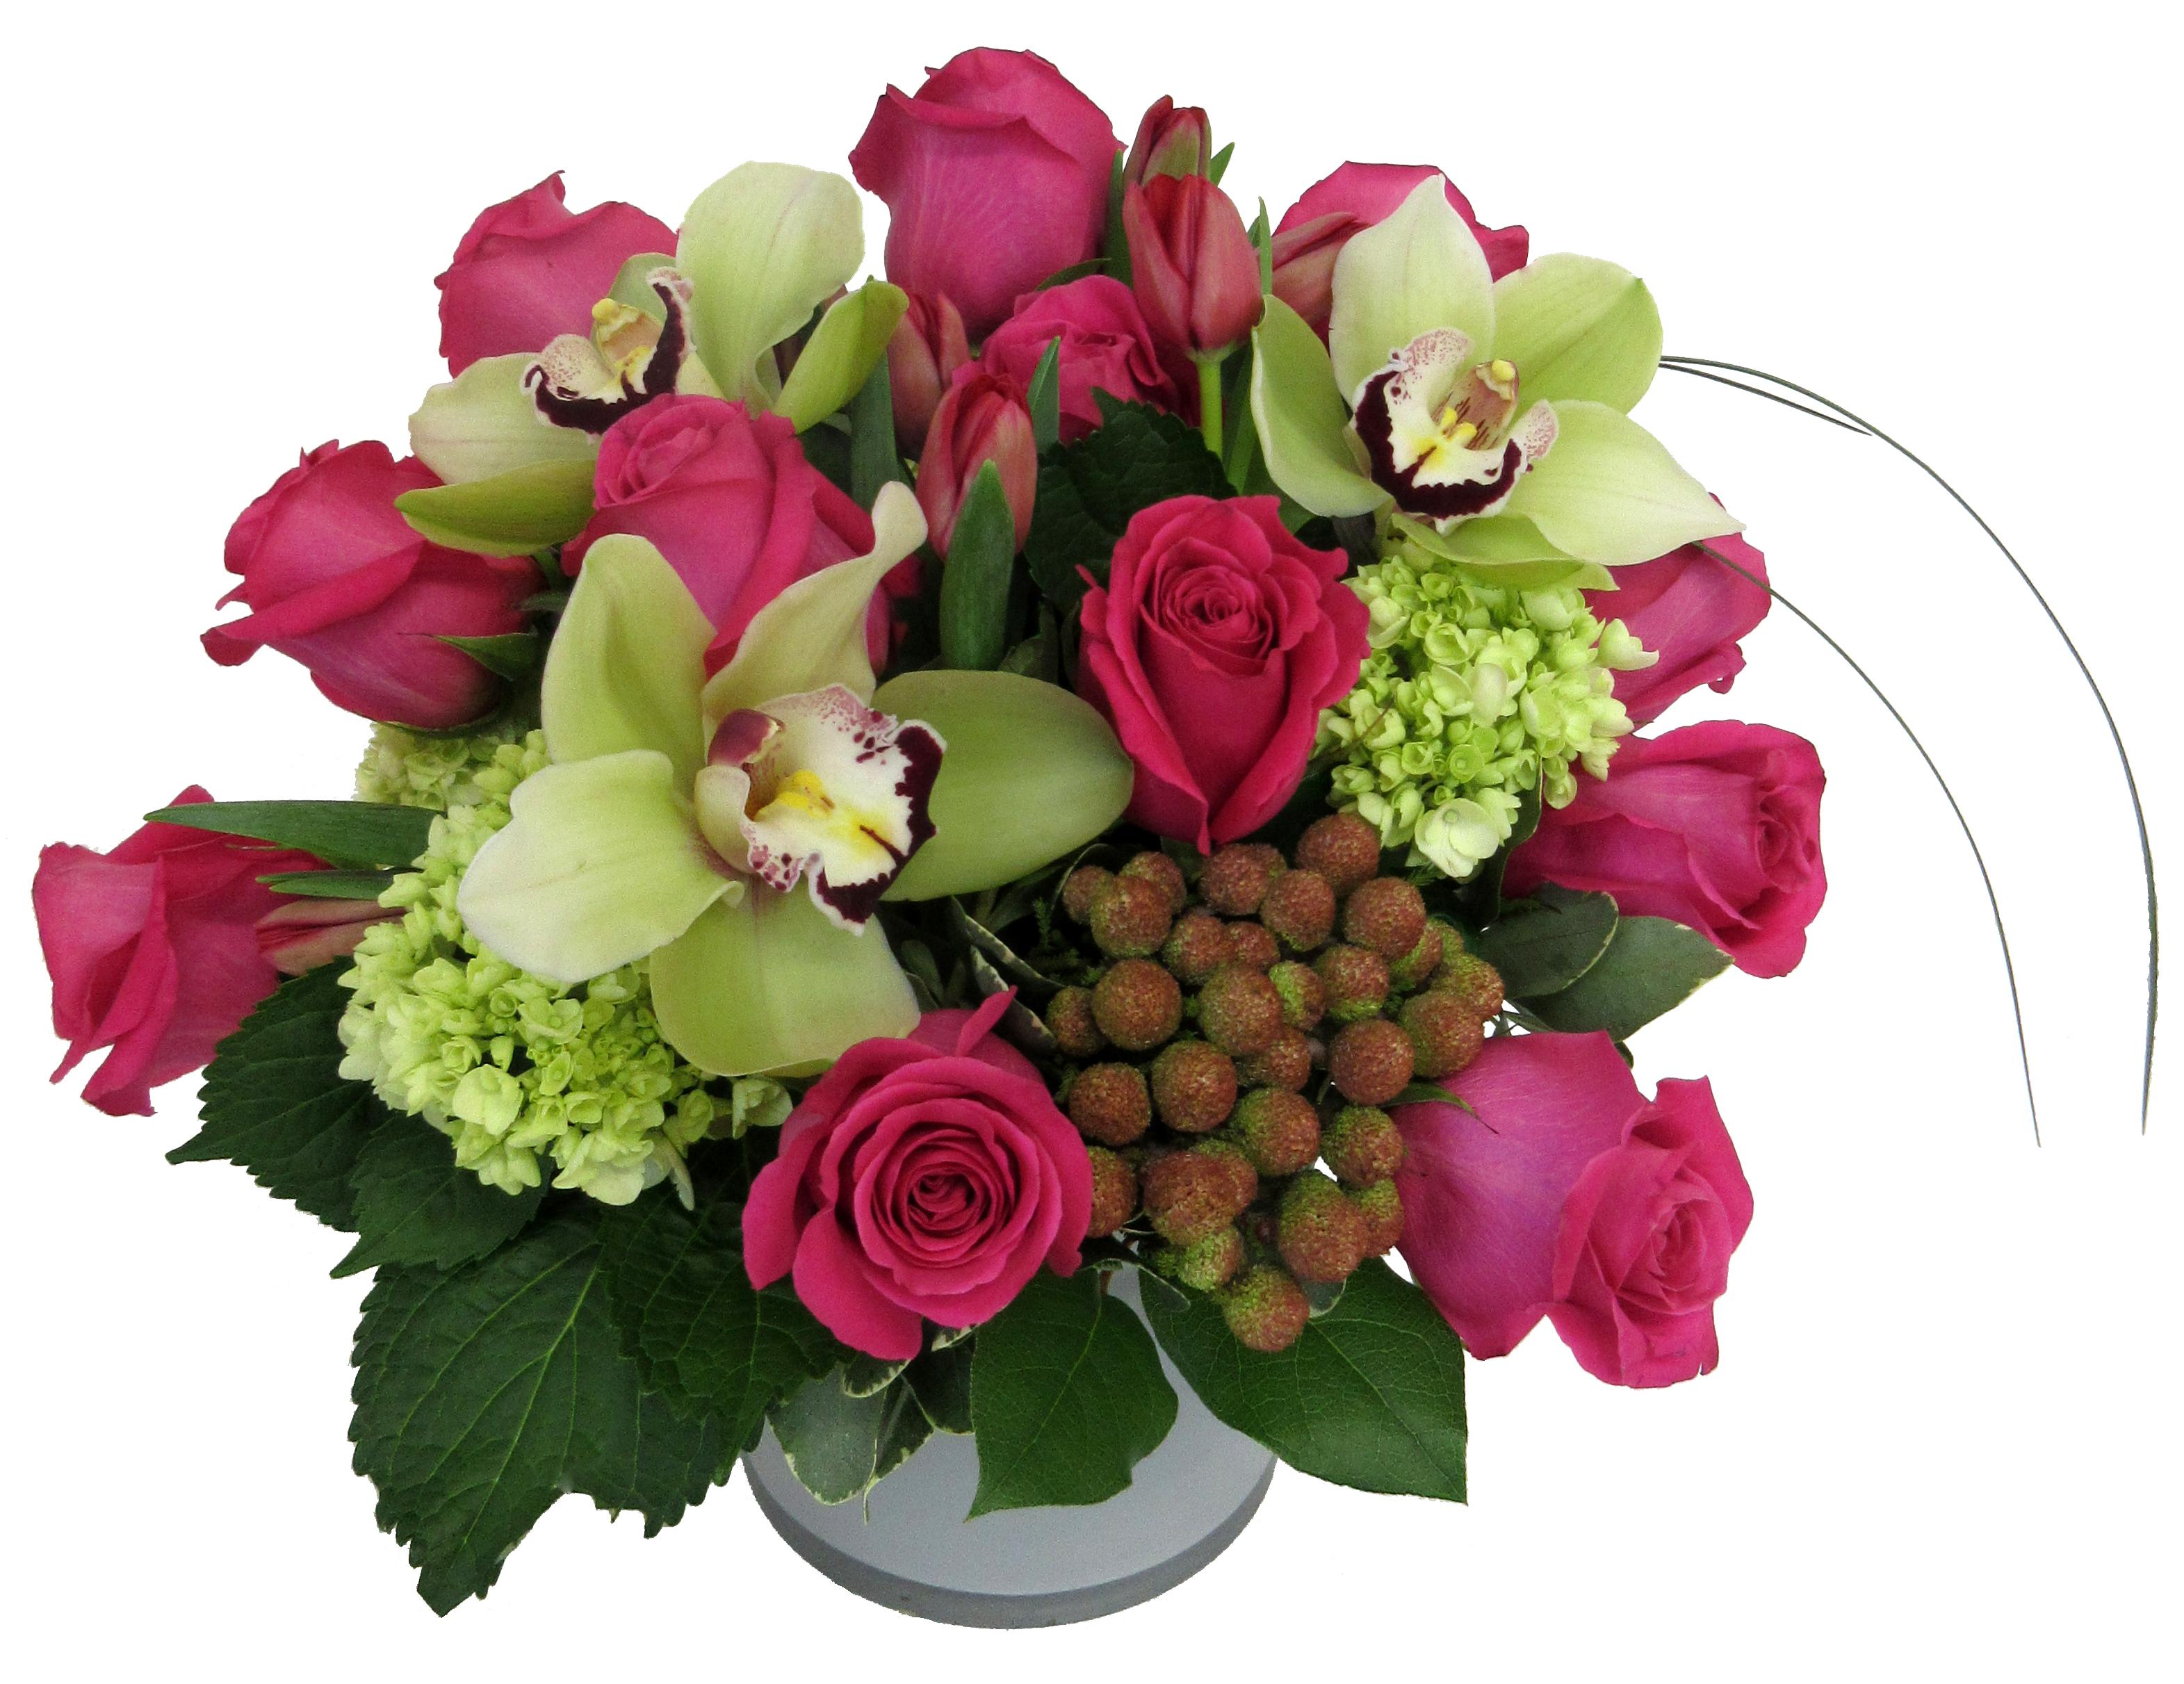 Kennedys Flowers Gifts 4665 Cascade Rd Se Grand Rapids Mi 49546